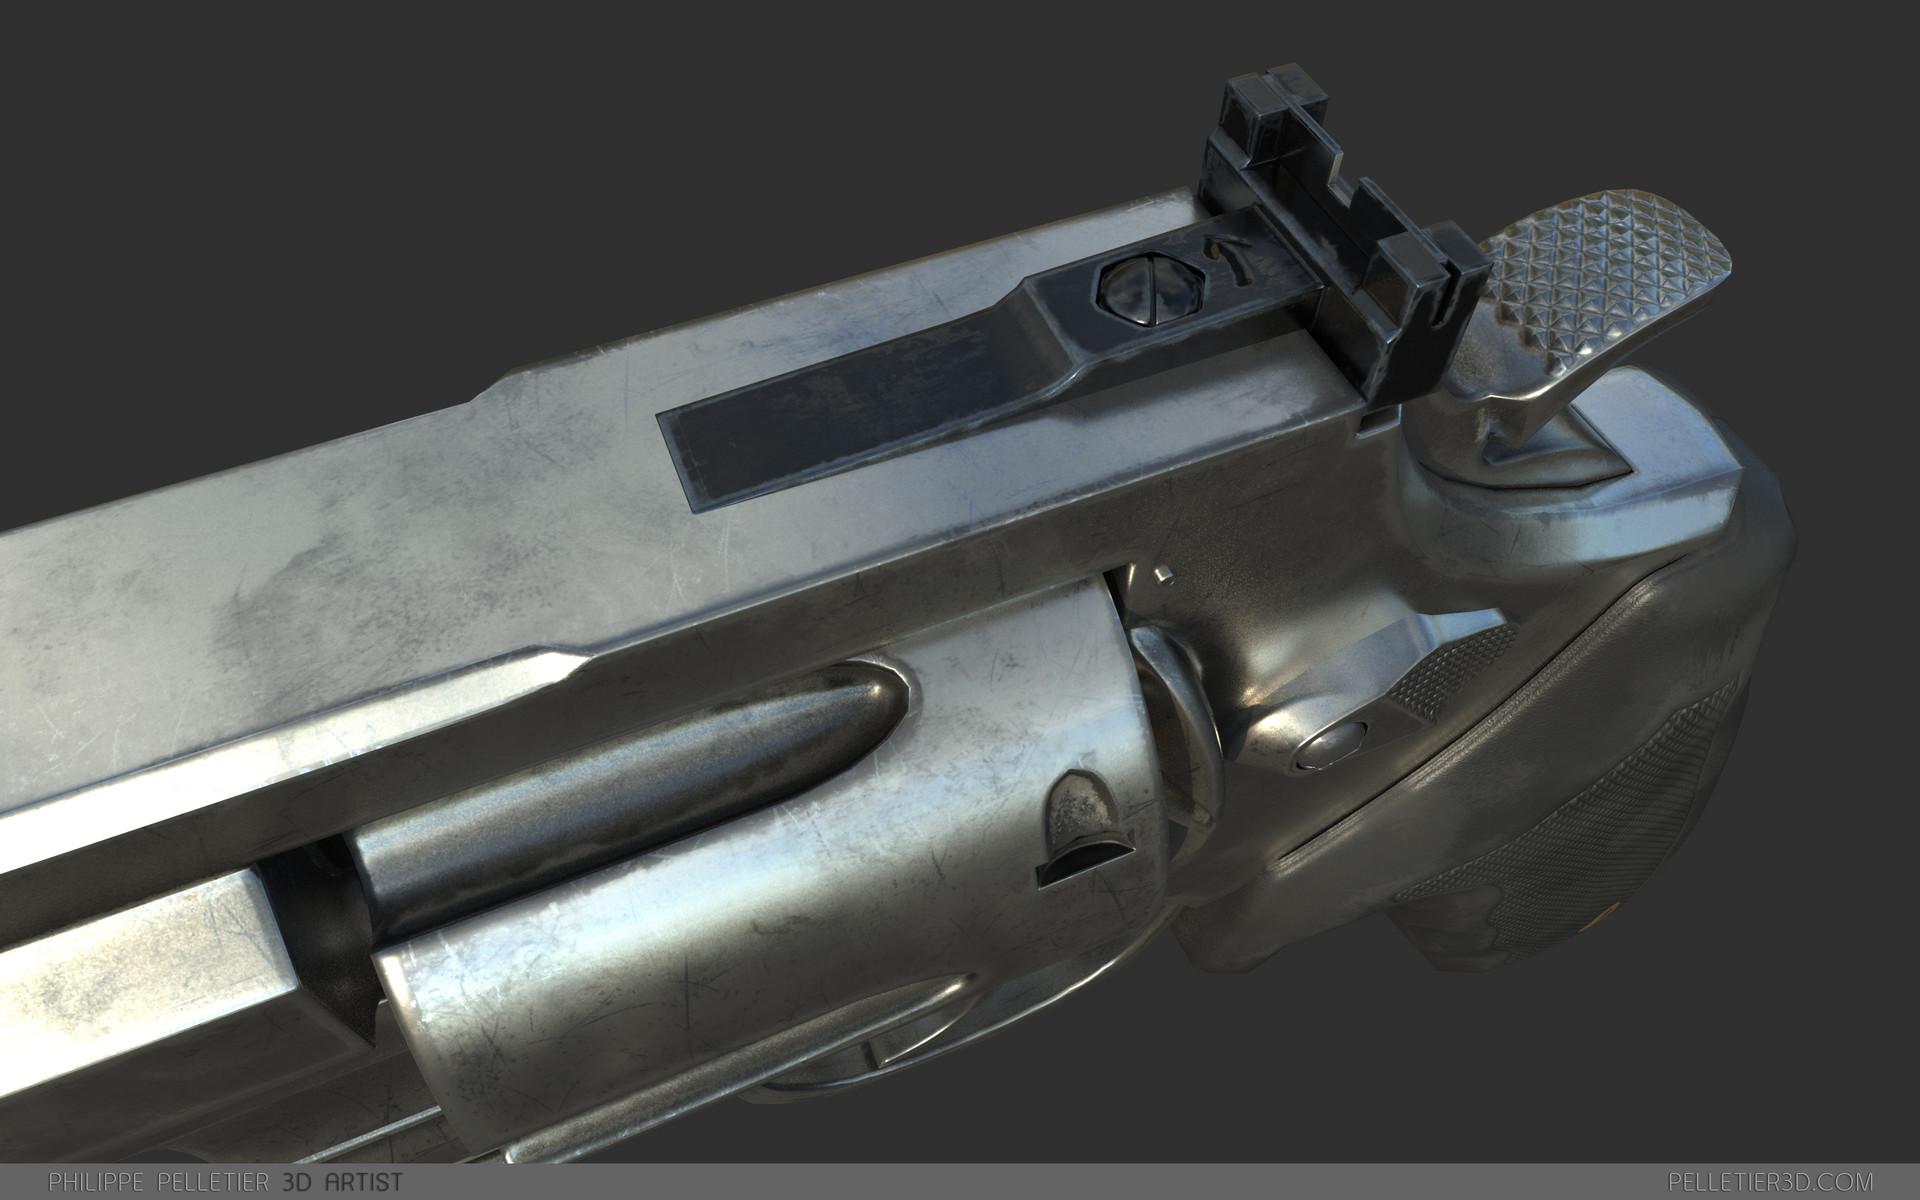 Philippe pelletier revolver 005